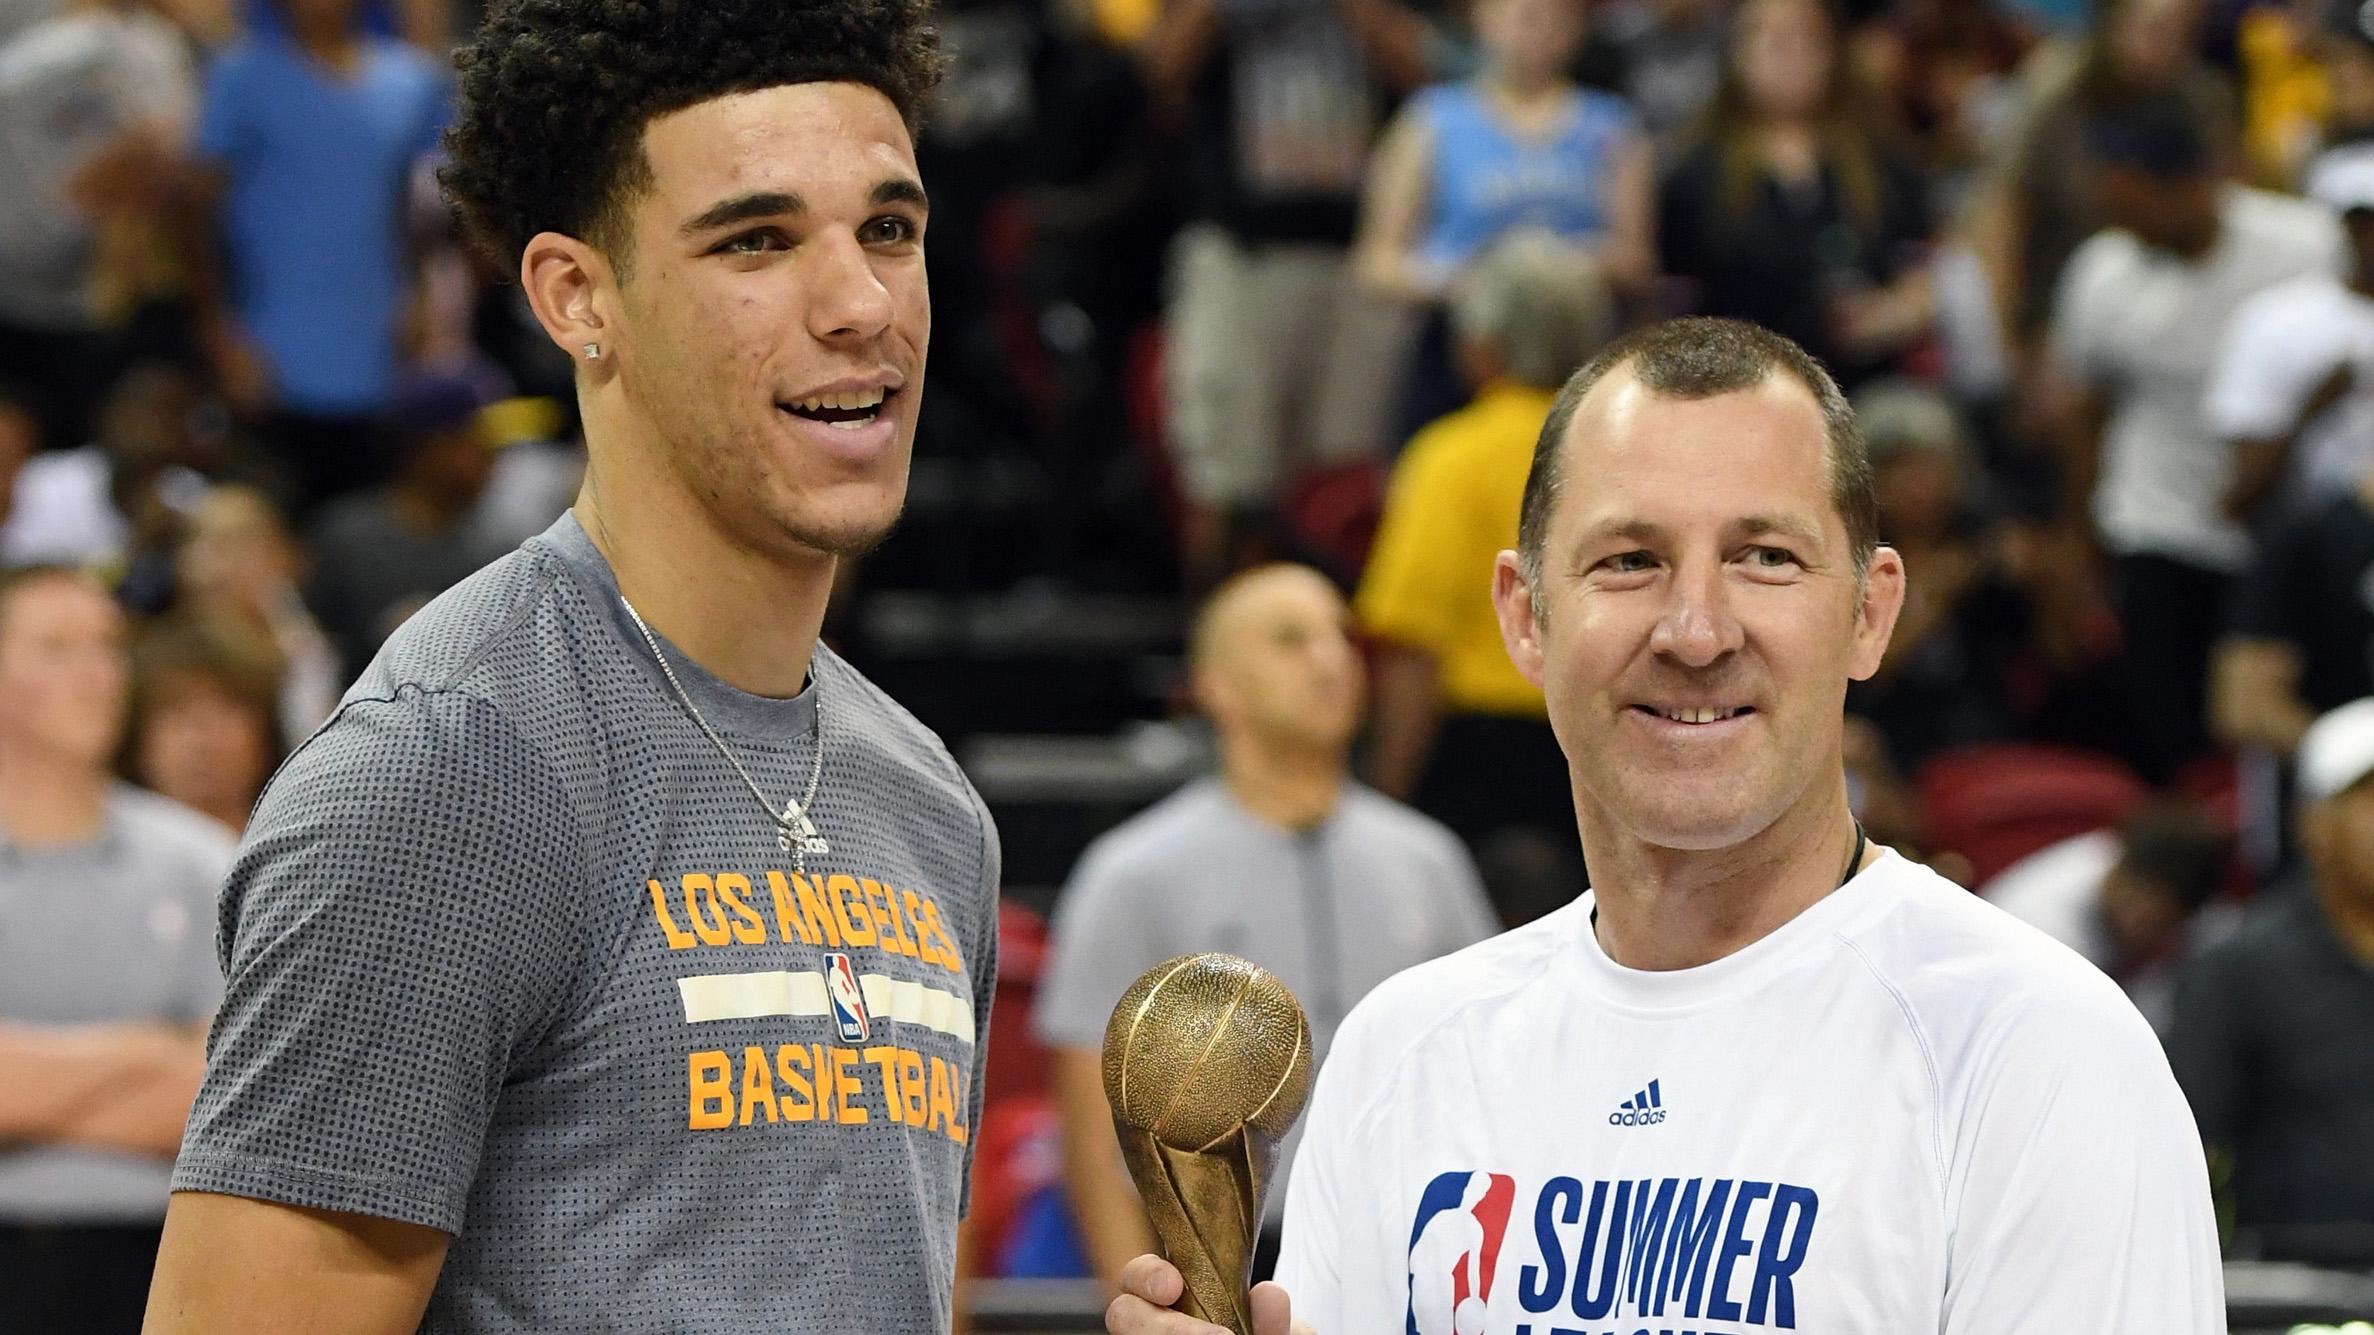 2017 Las Vegas Summer League – Los Angeles Lakers v Portland Trail Blazers